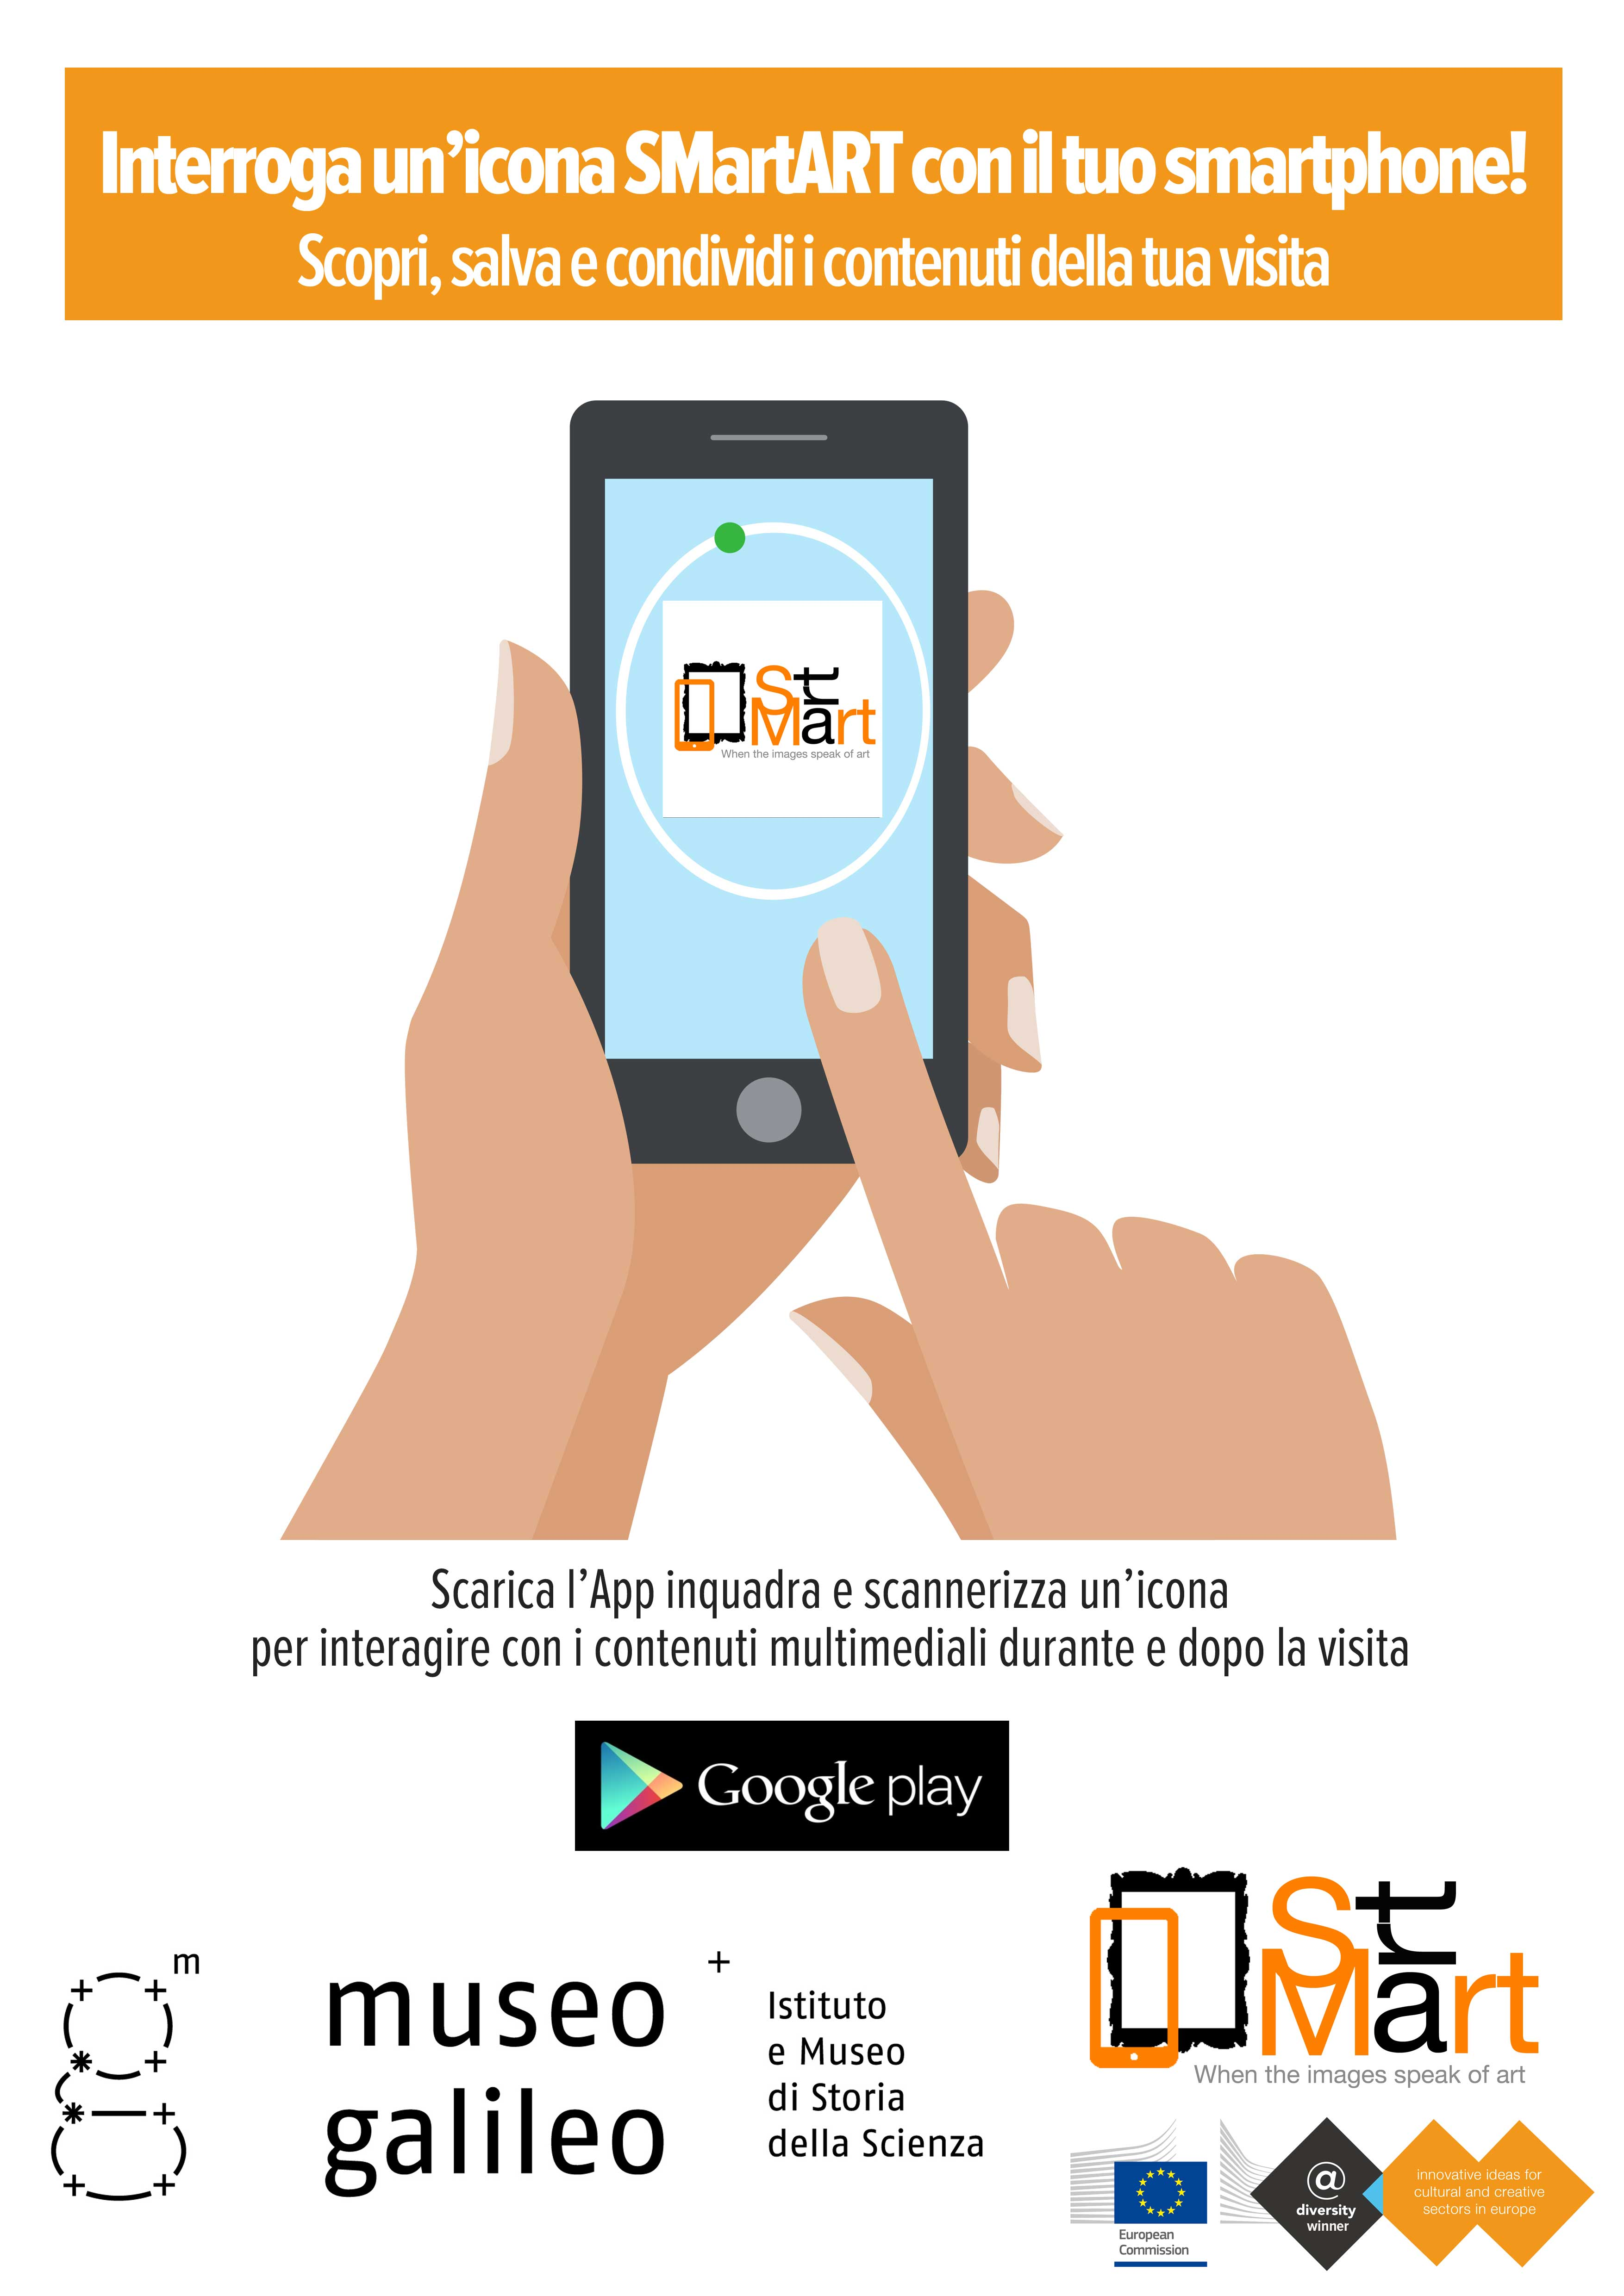 Museo Galileo Firenze.First Smartart Test Museo Galileo Firenze Image And Communication